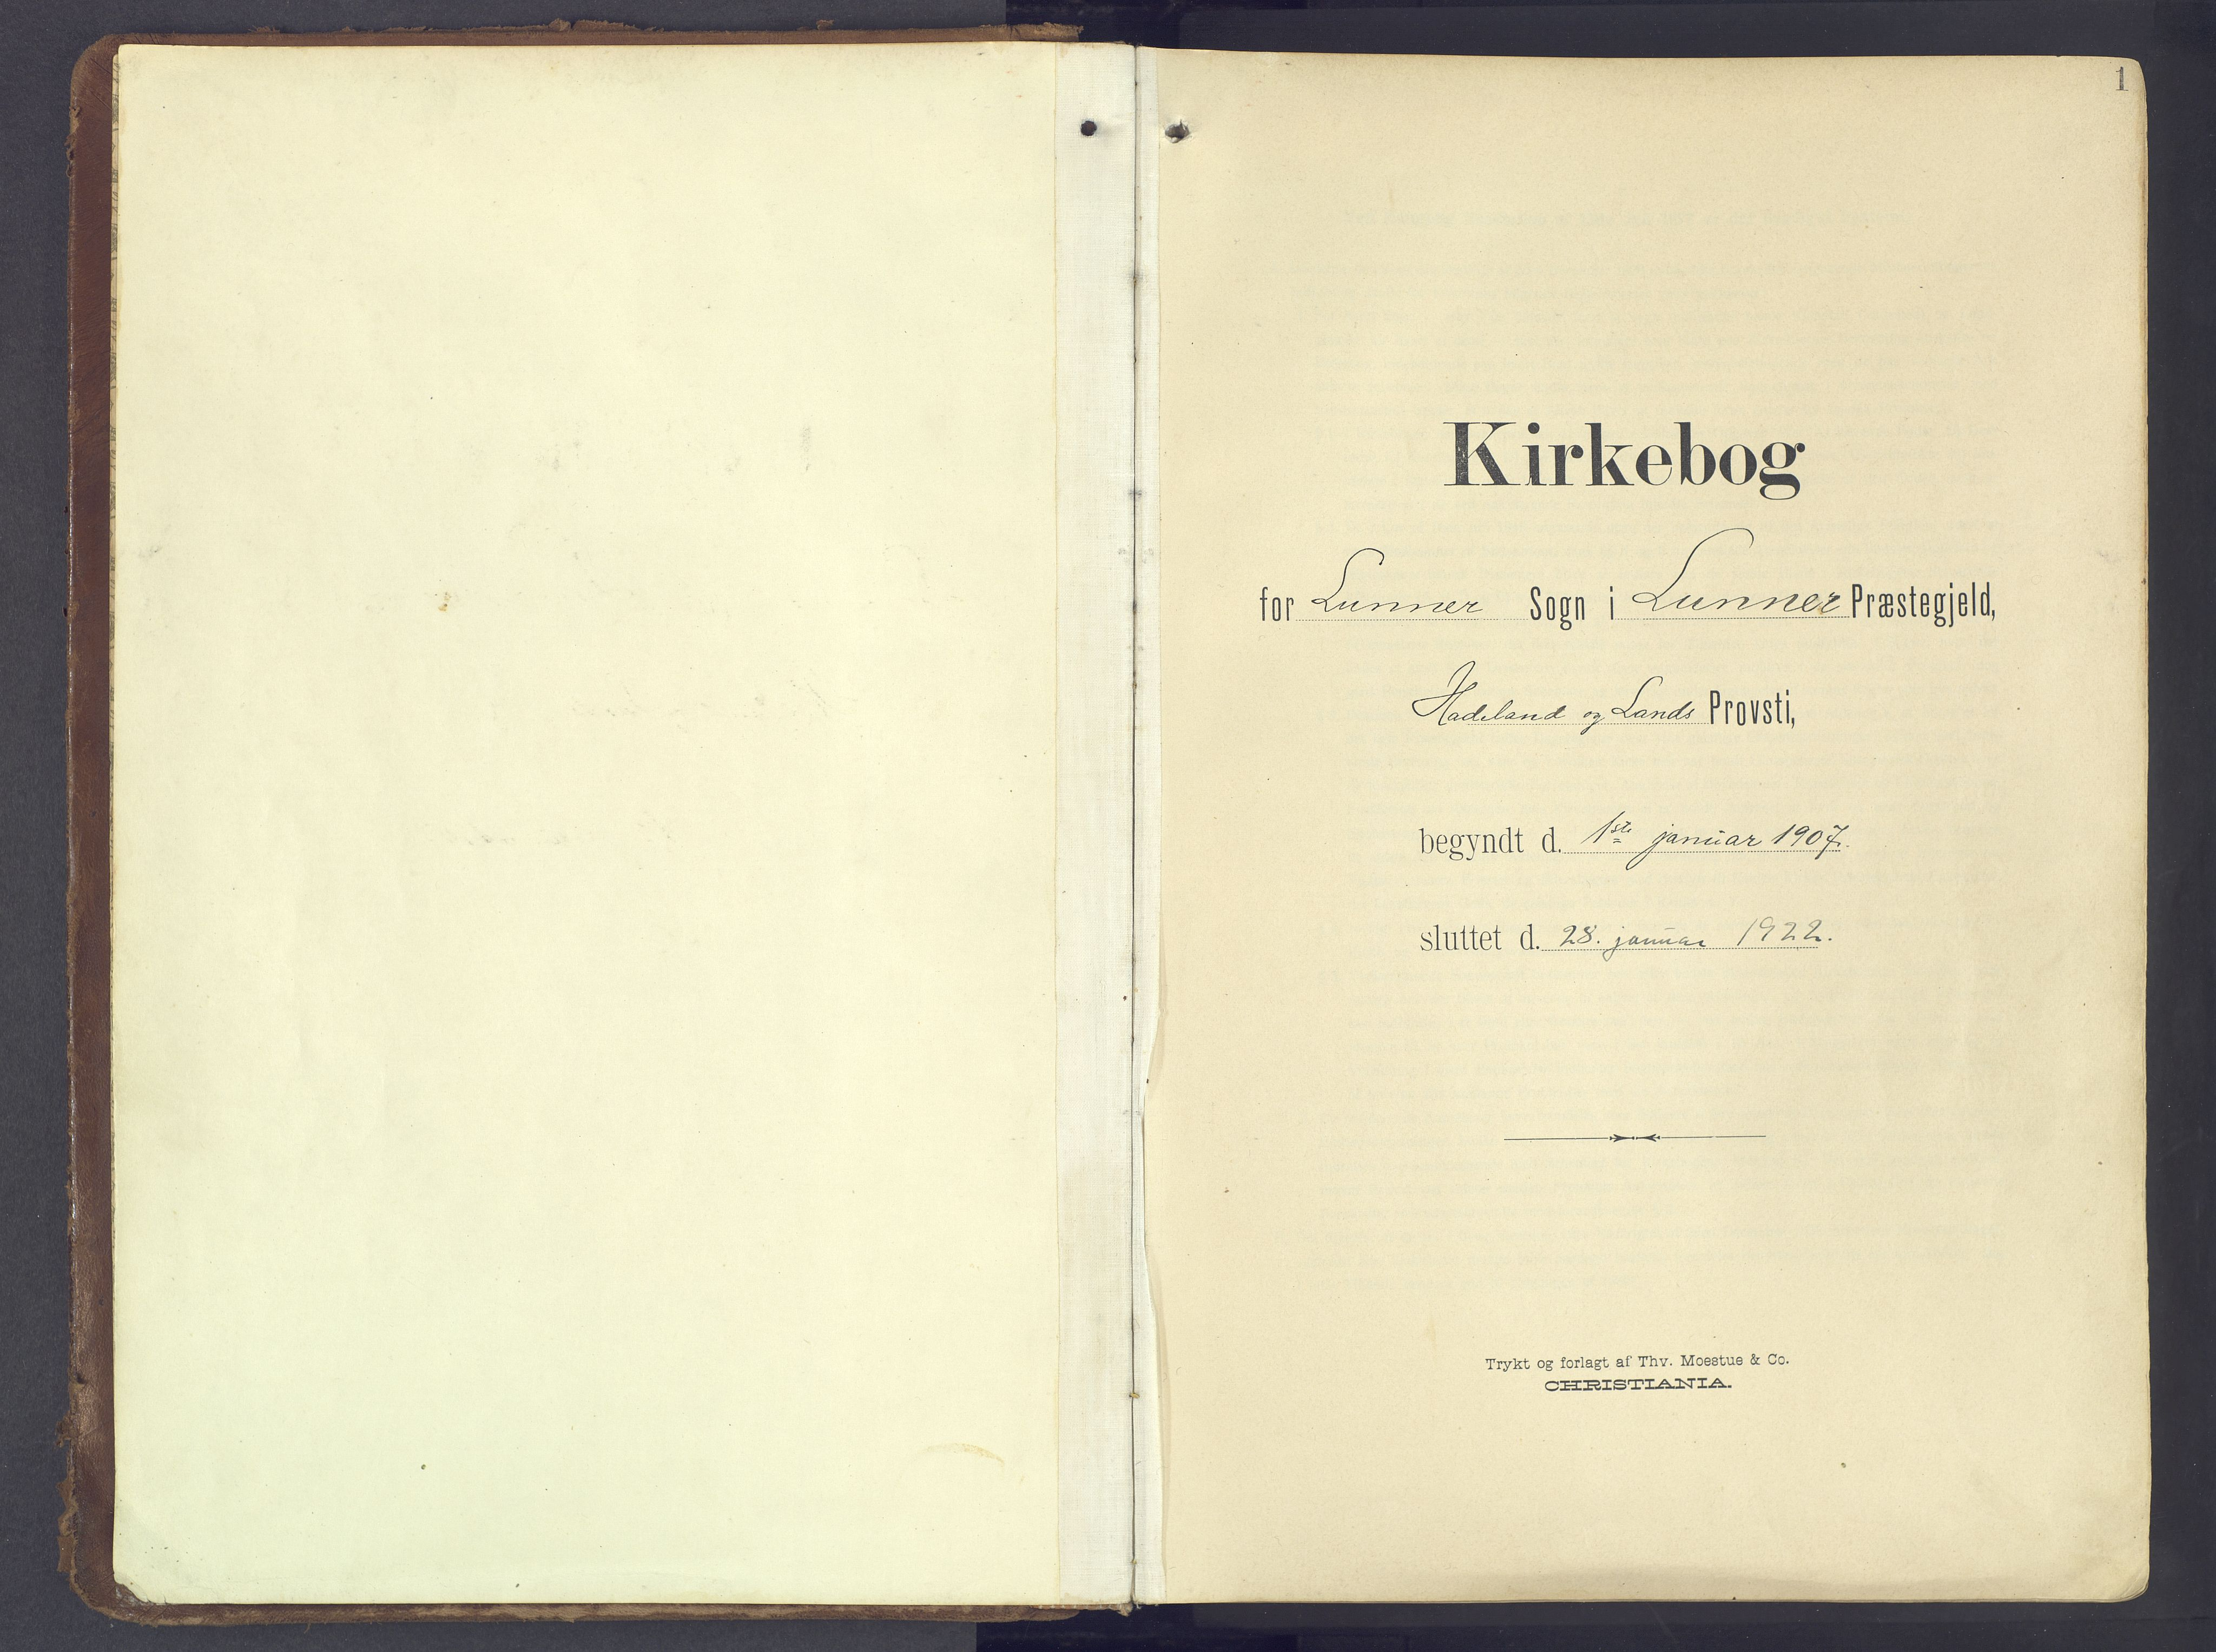 SAH, Lunner prestekontor, H/Ha/Haa/L0001: Ministerialbok nr. 1, 1907-1922, s. 1